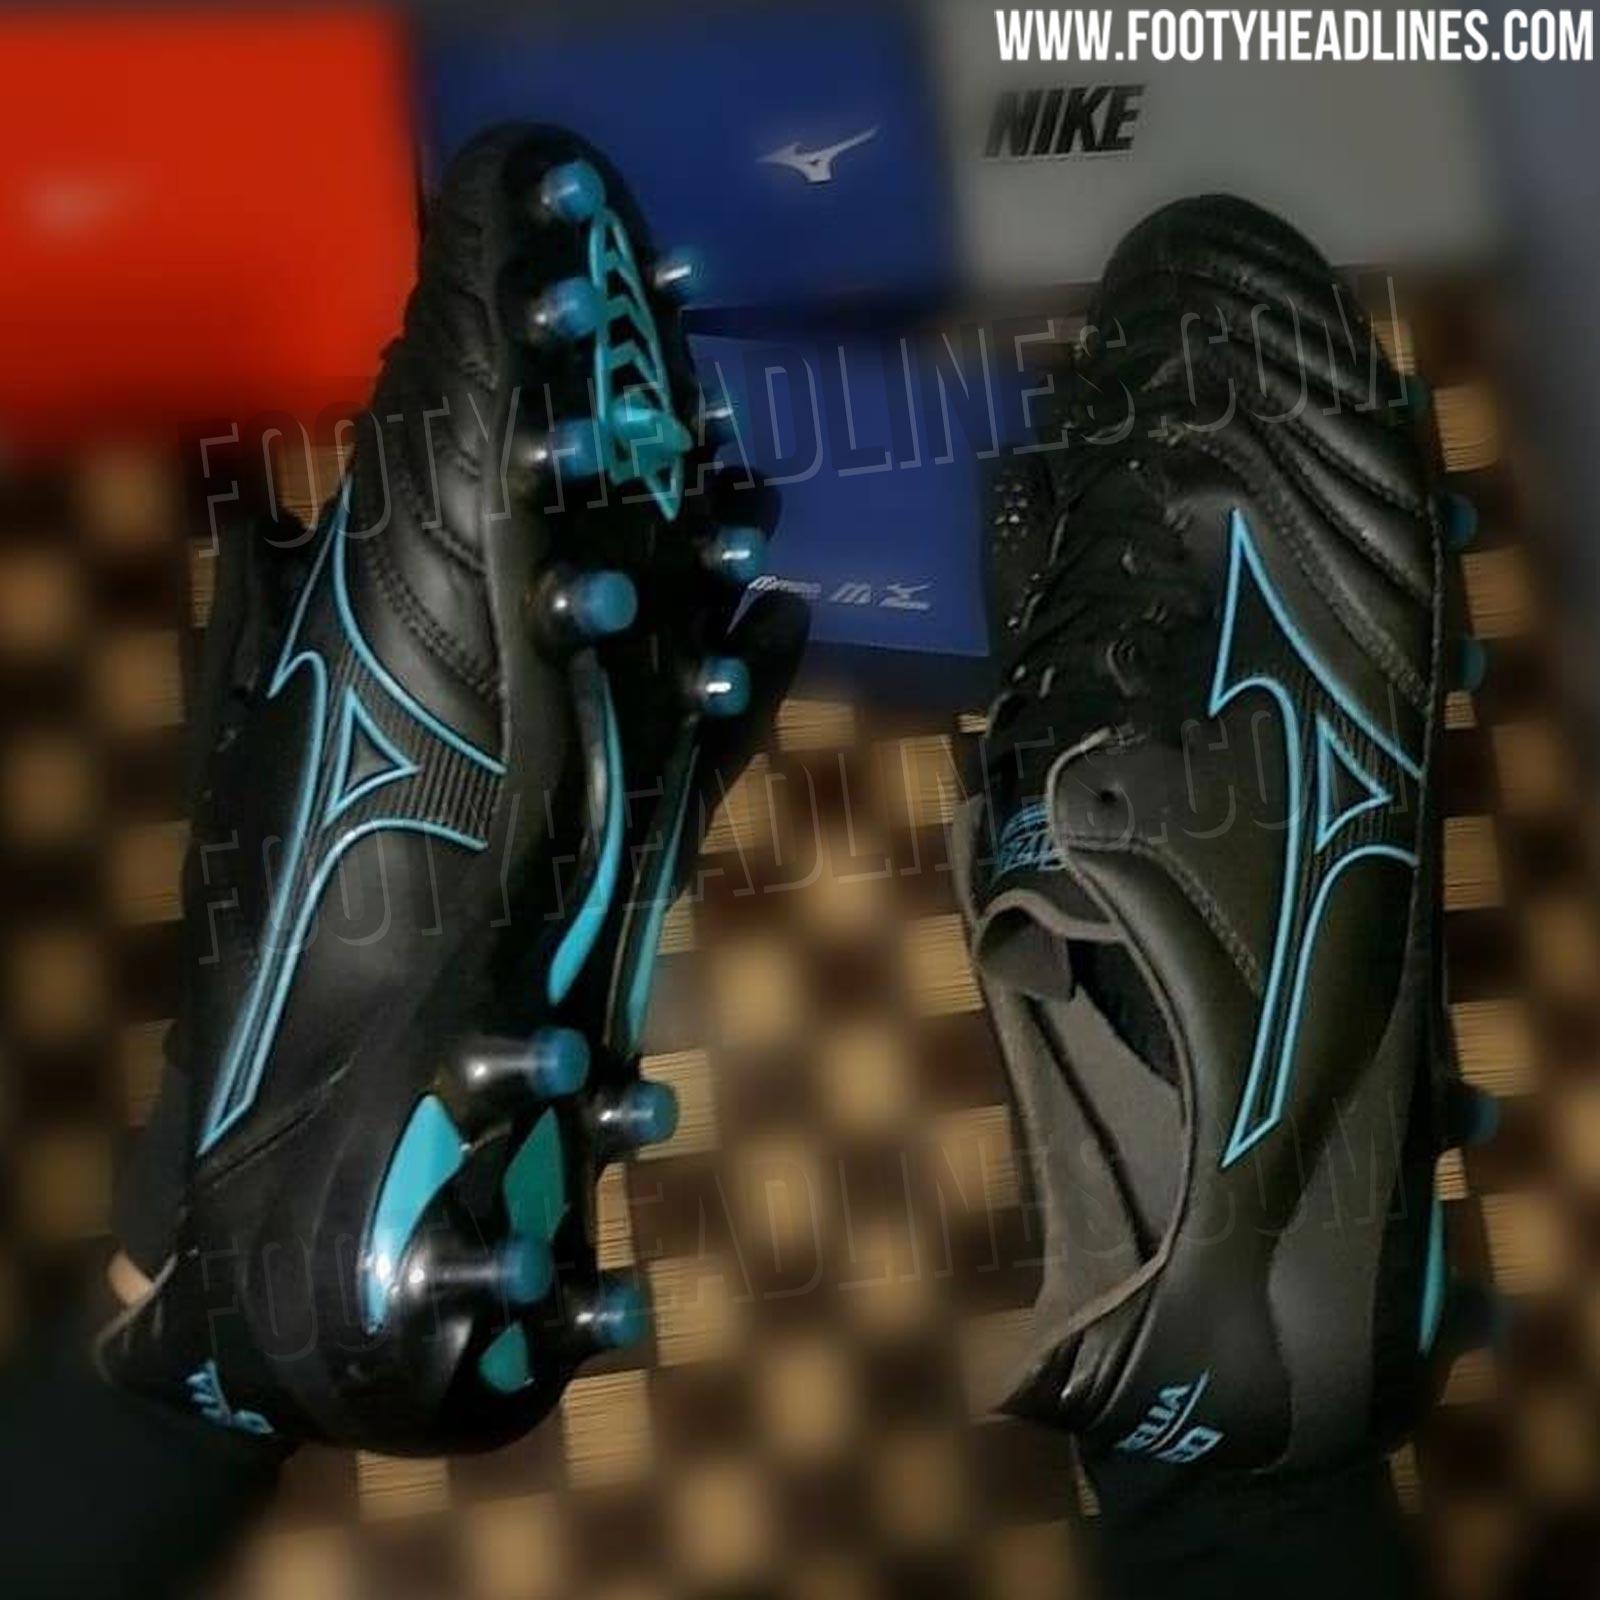 newest 0c96e 6213f Stunning Black / Turquoise Mizuno Morelia Neo 2 2019 Boots ...